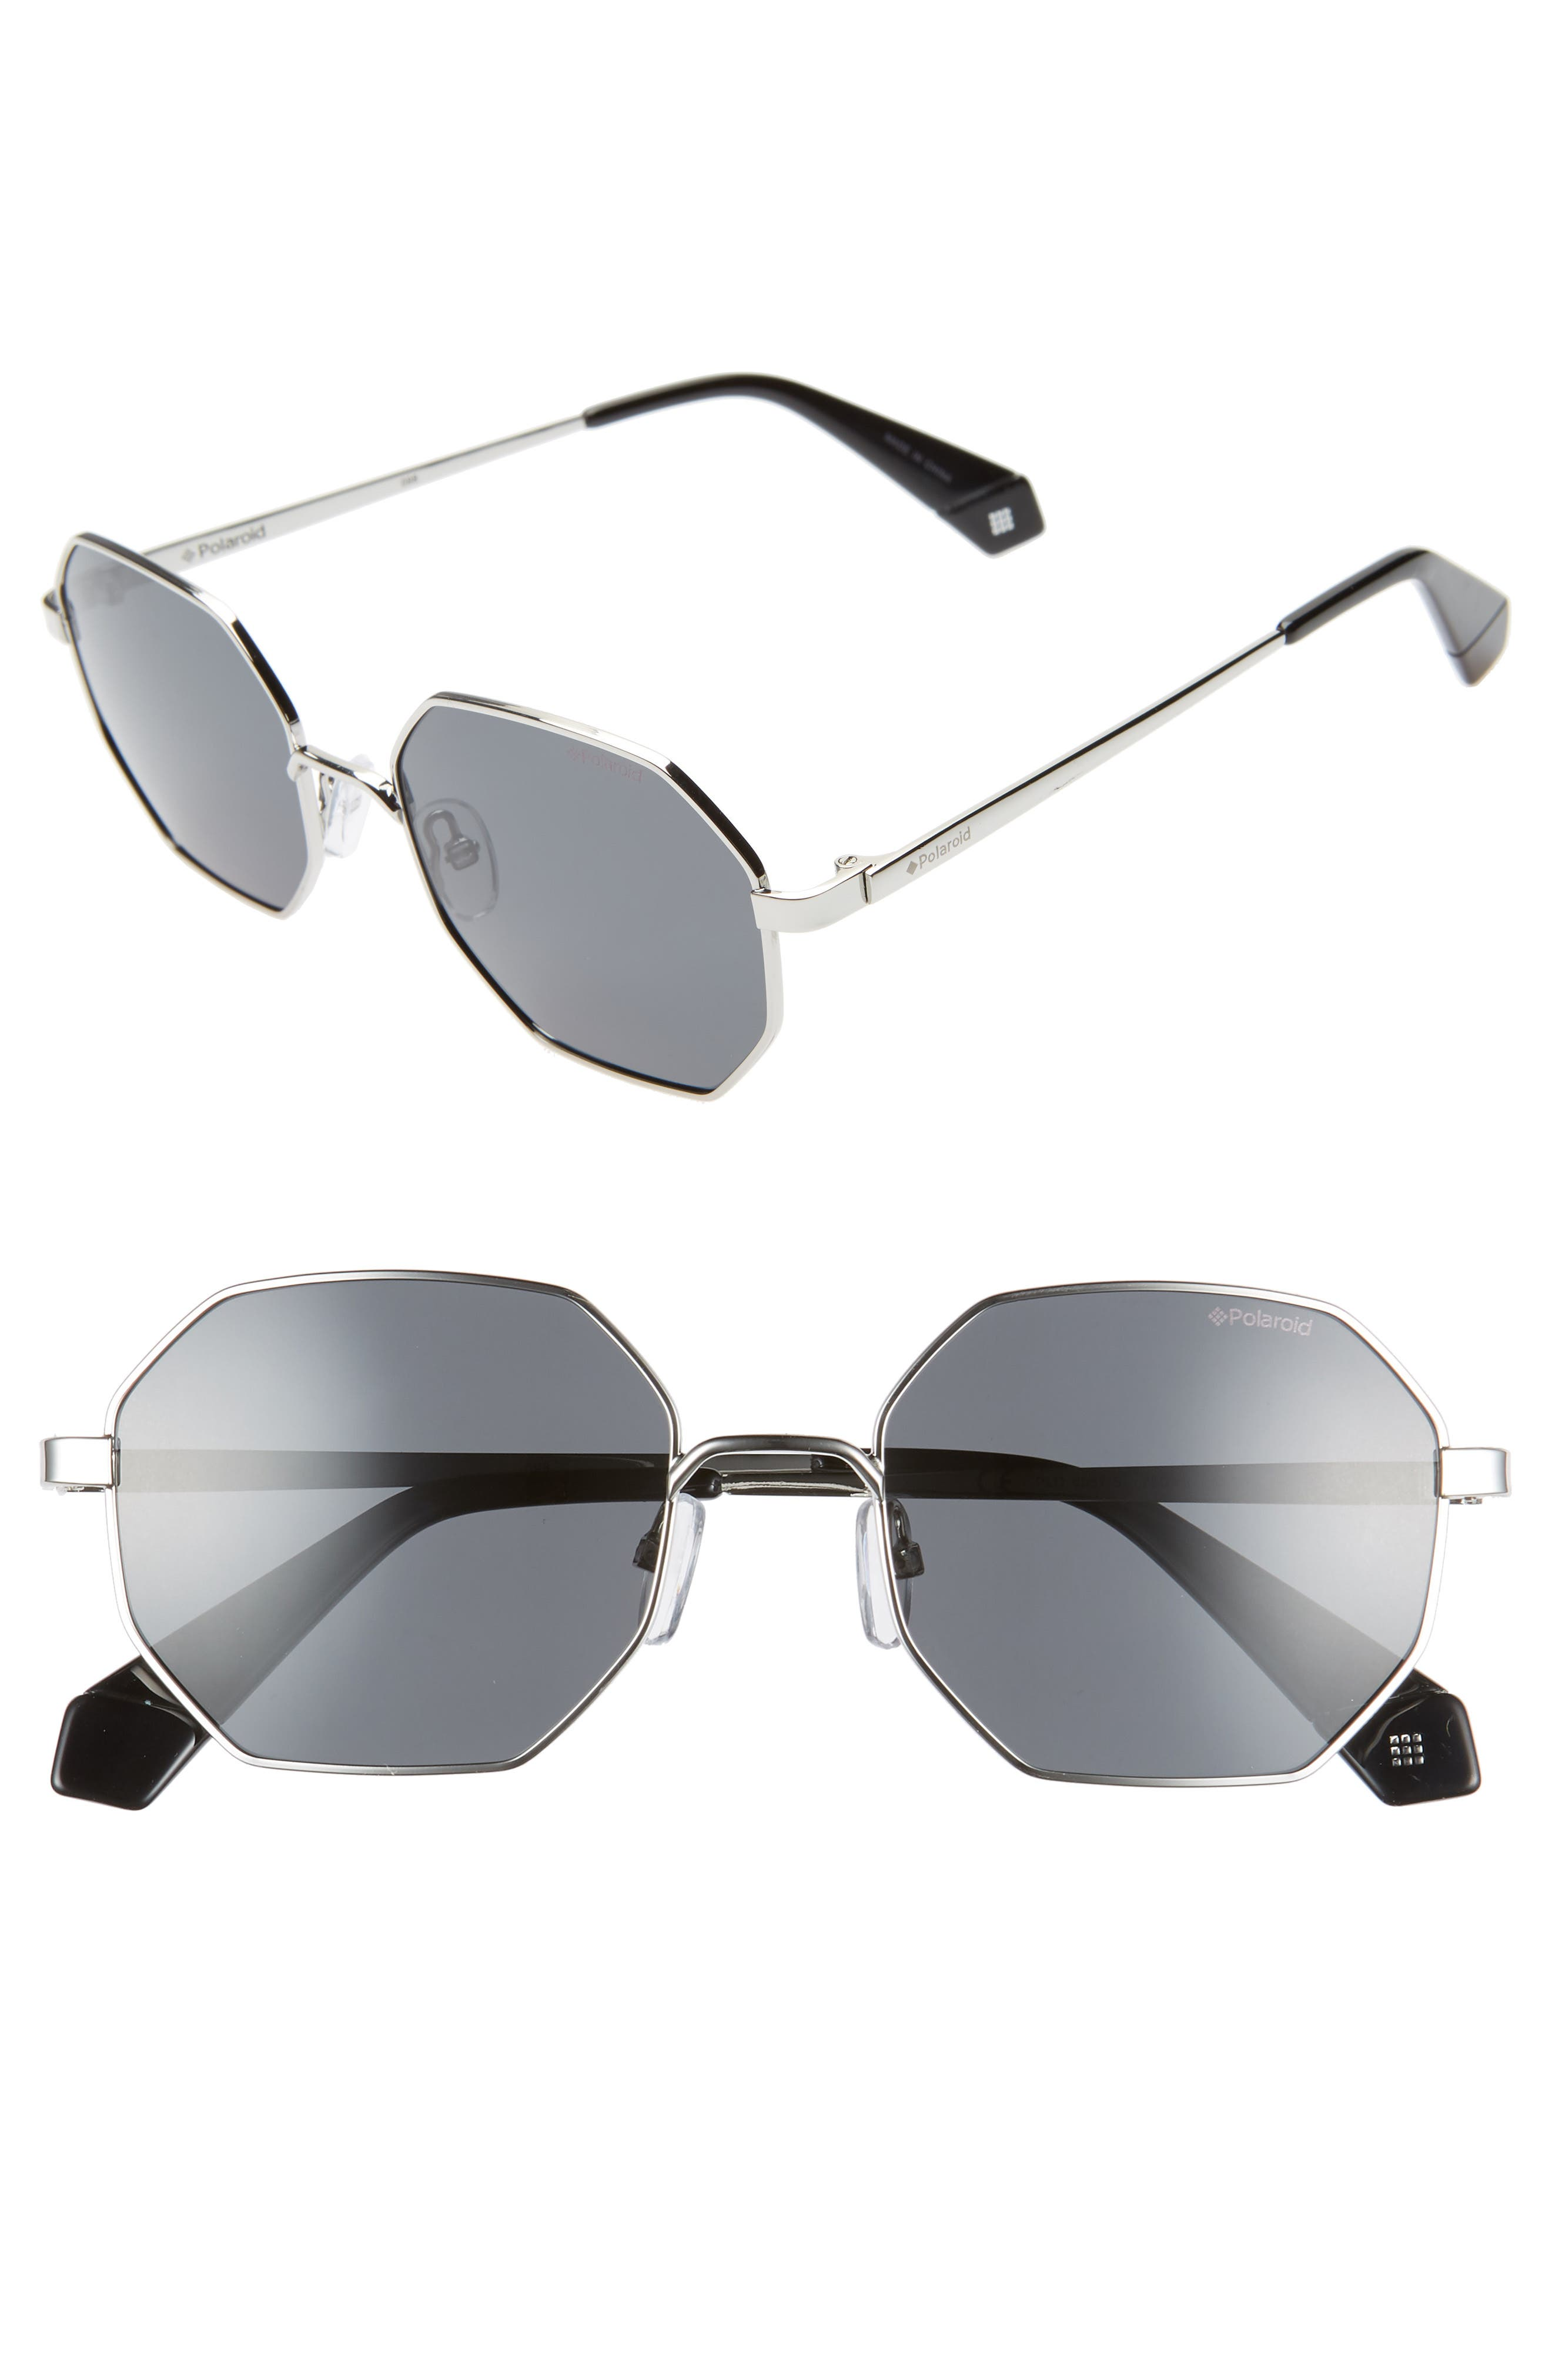 Polaroid 5m Geometric Polarized Sunglasses - Silver/ Black